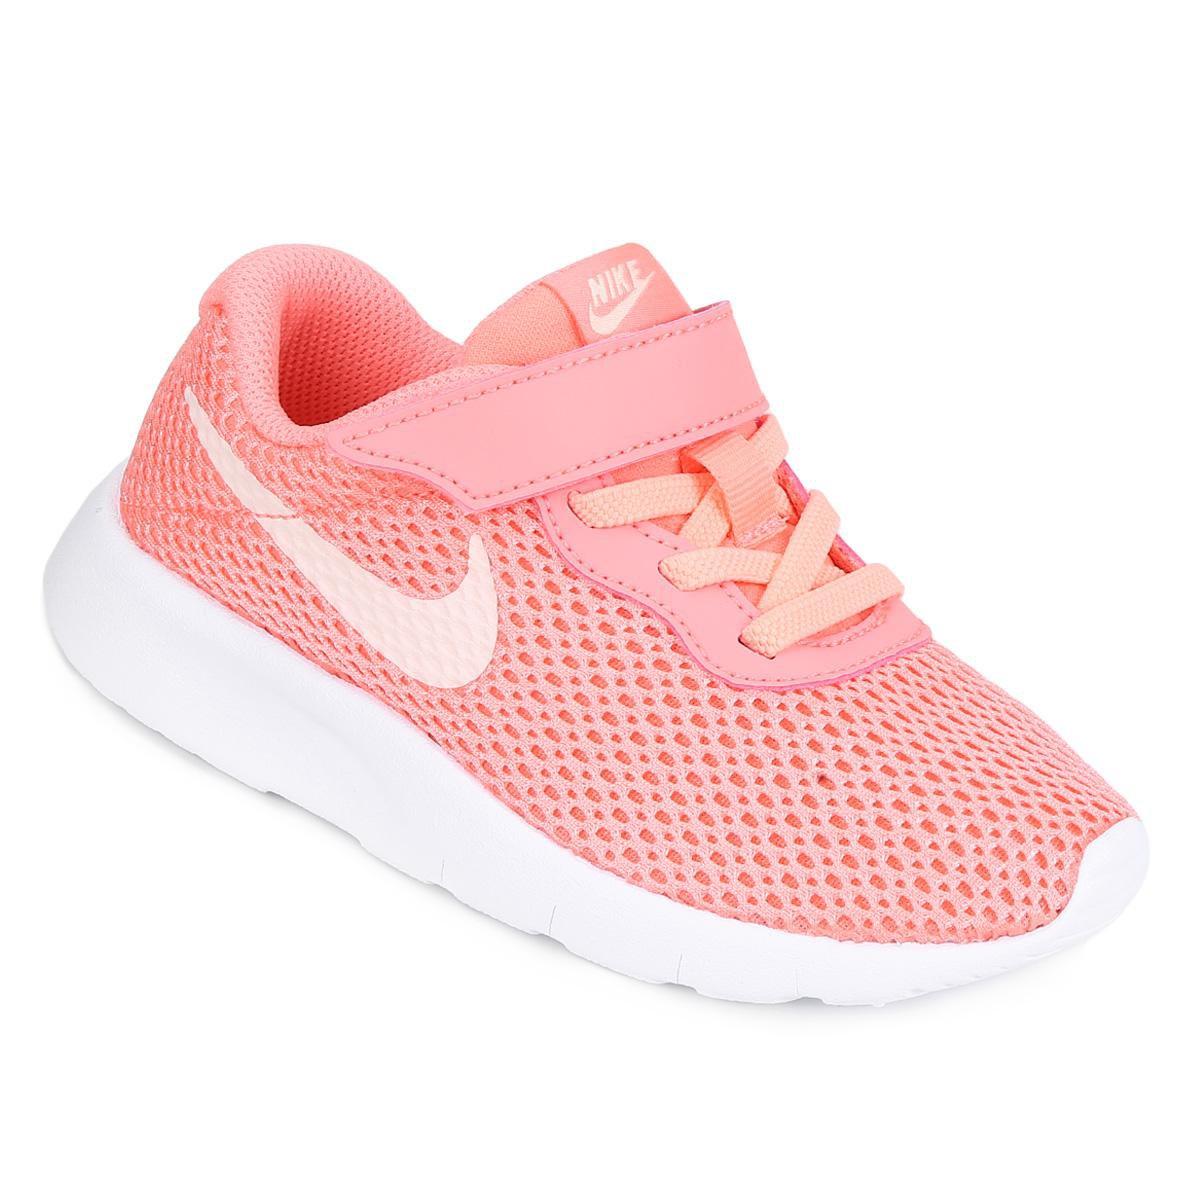 Tênis Infantil Infantil Tênis Nike Tanjun Compre Agora Netsapatos c5407f 4572afbc42c45